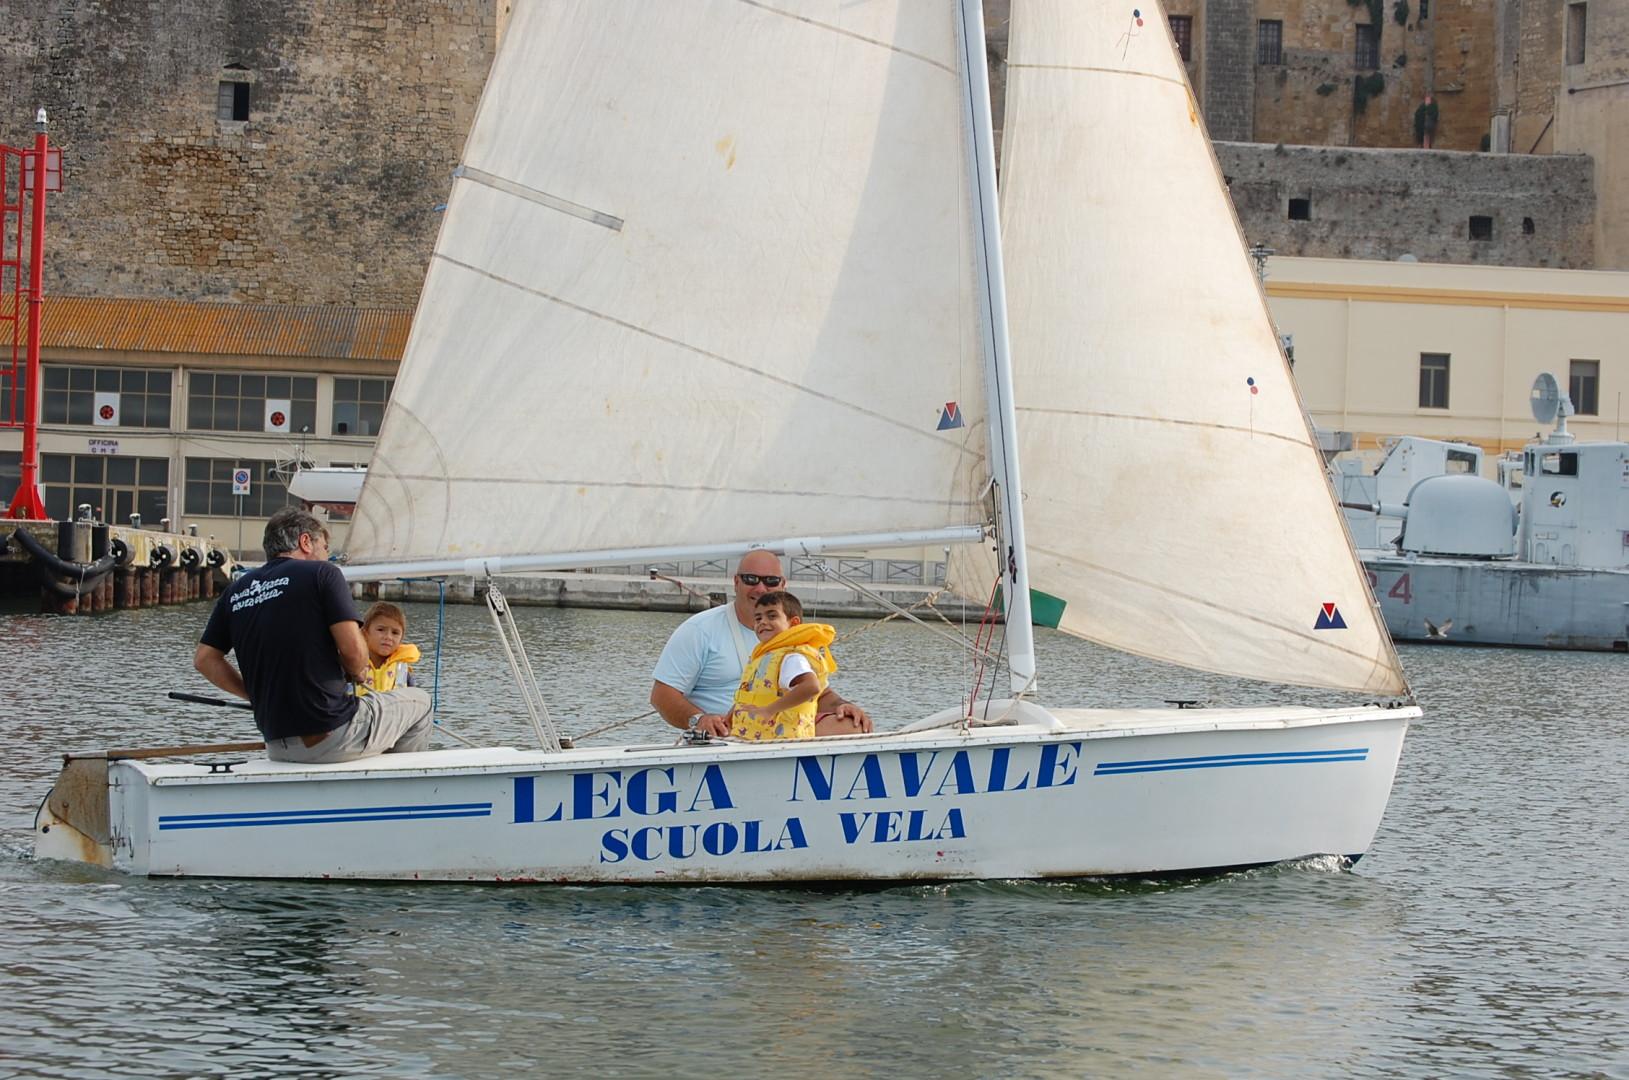 Scuola-di-vela-lega-navale-LNI-Brindisi (21)